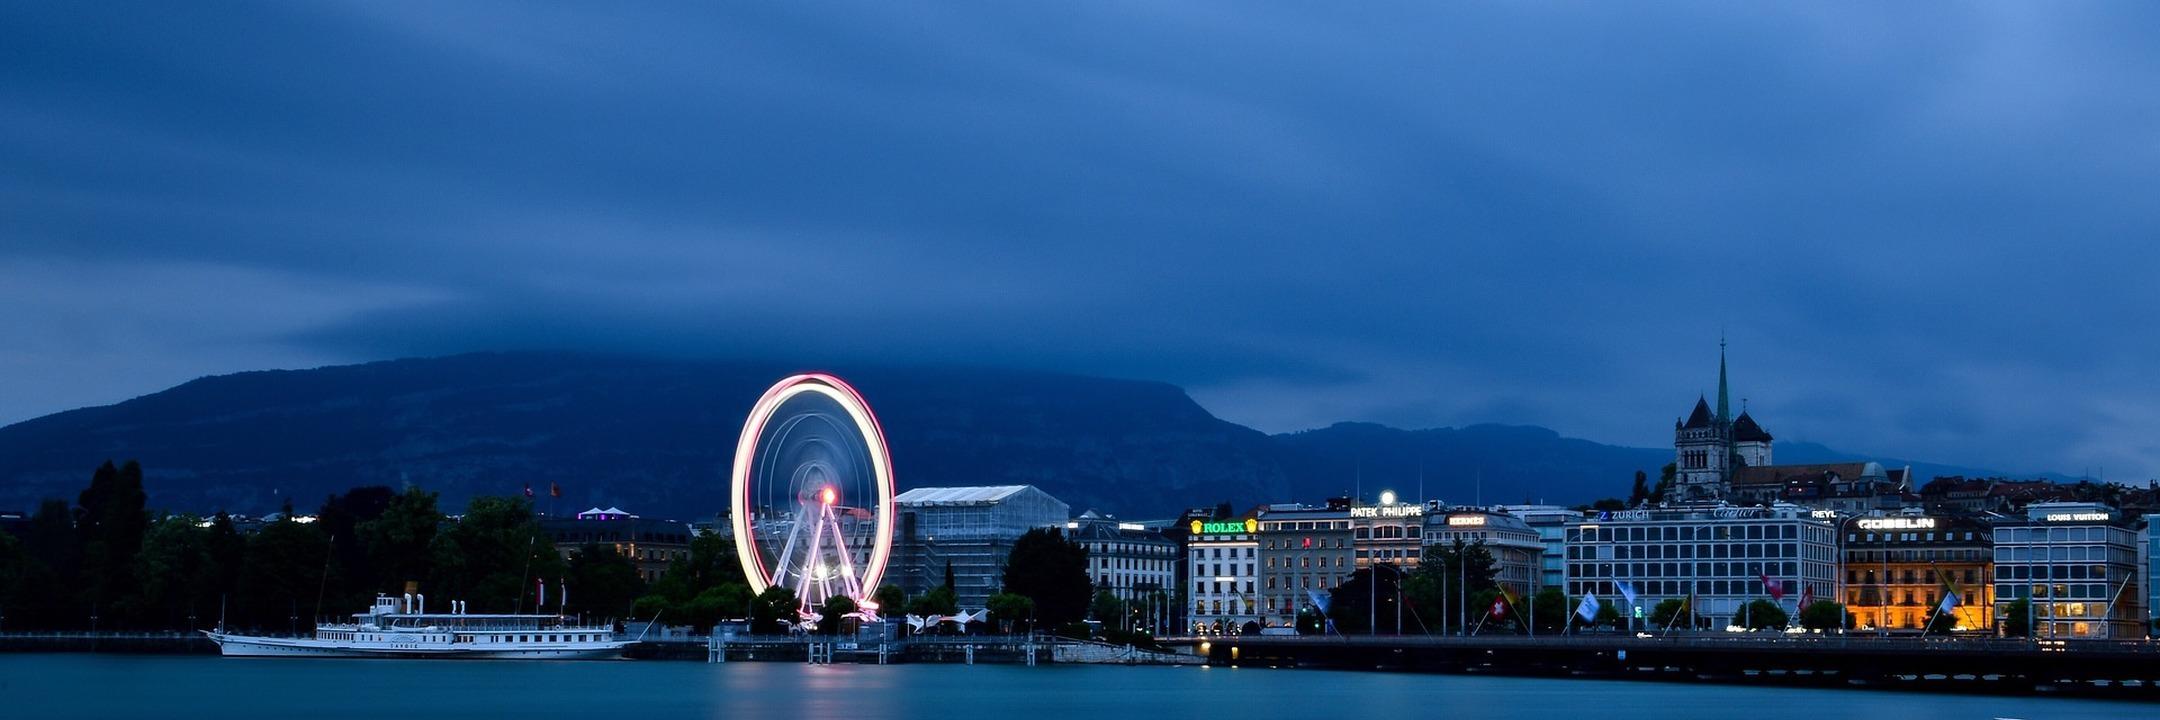 Genebra: a cidade suíça favorita entre as celebridades